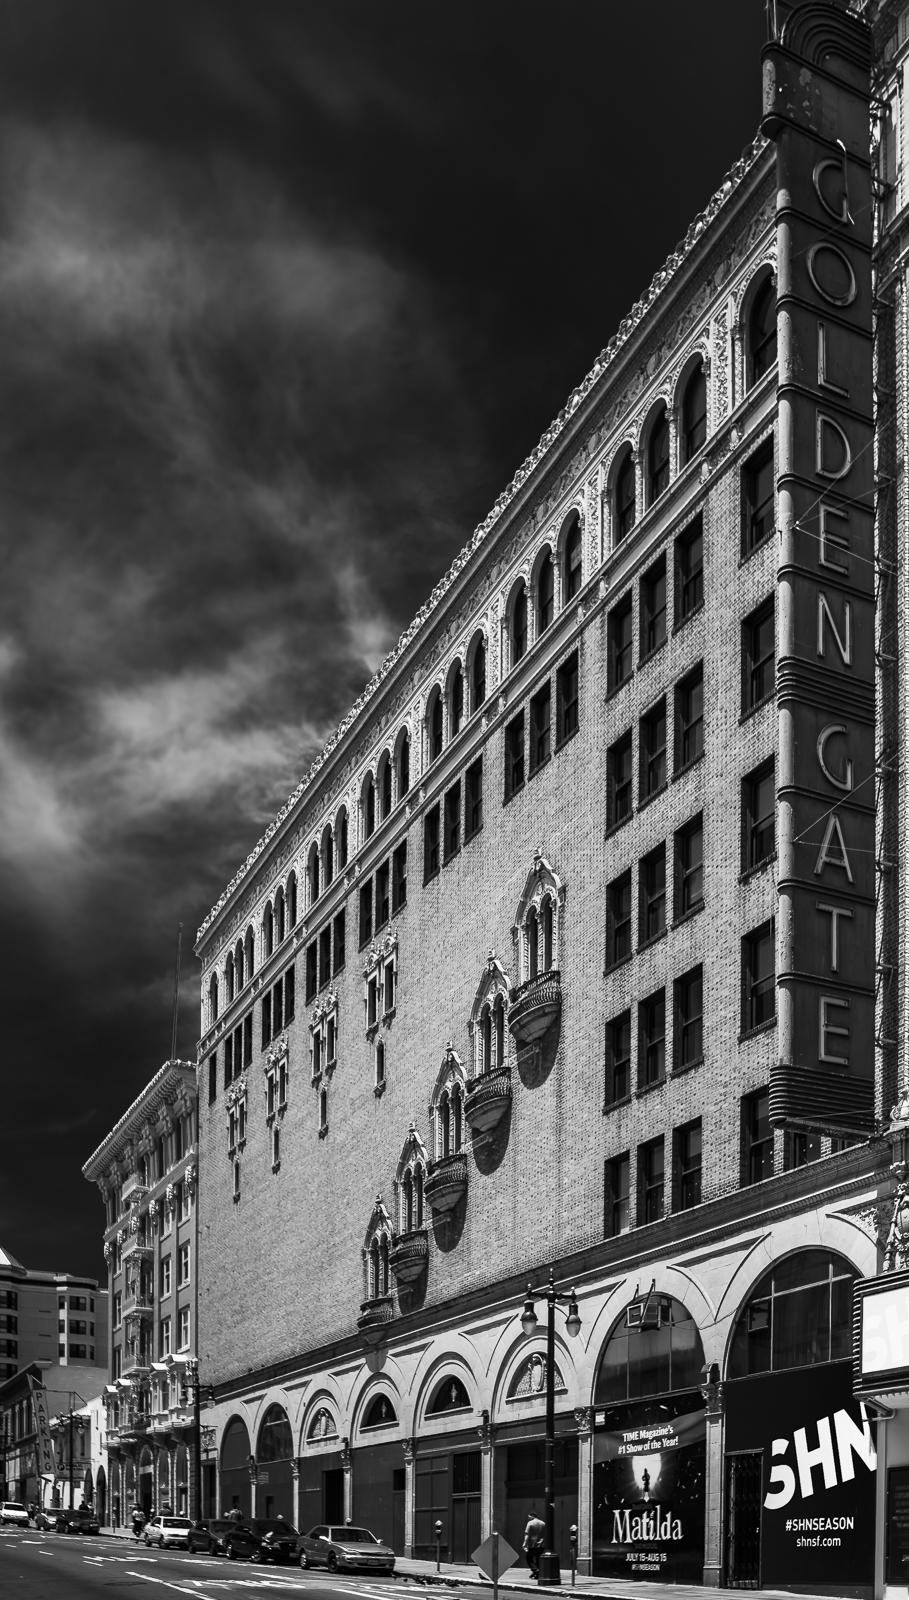 Golden Gate Theater San Francisco